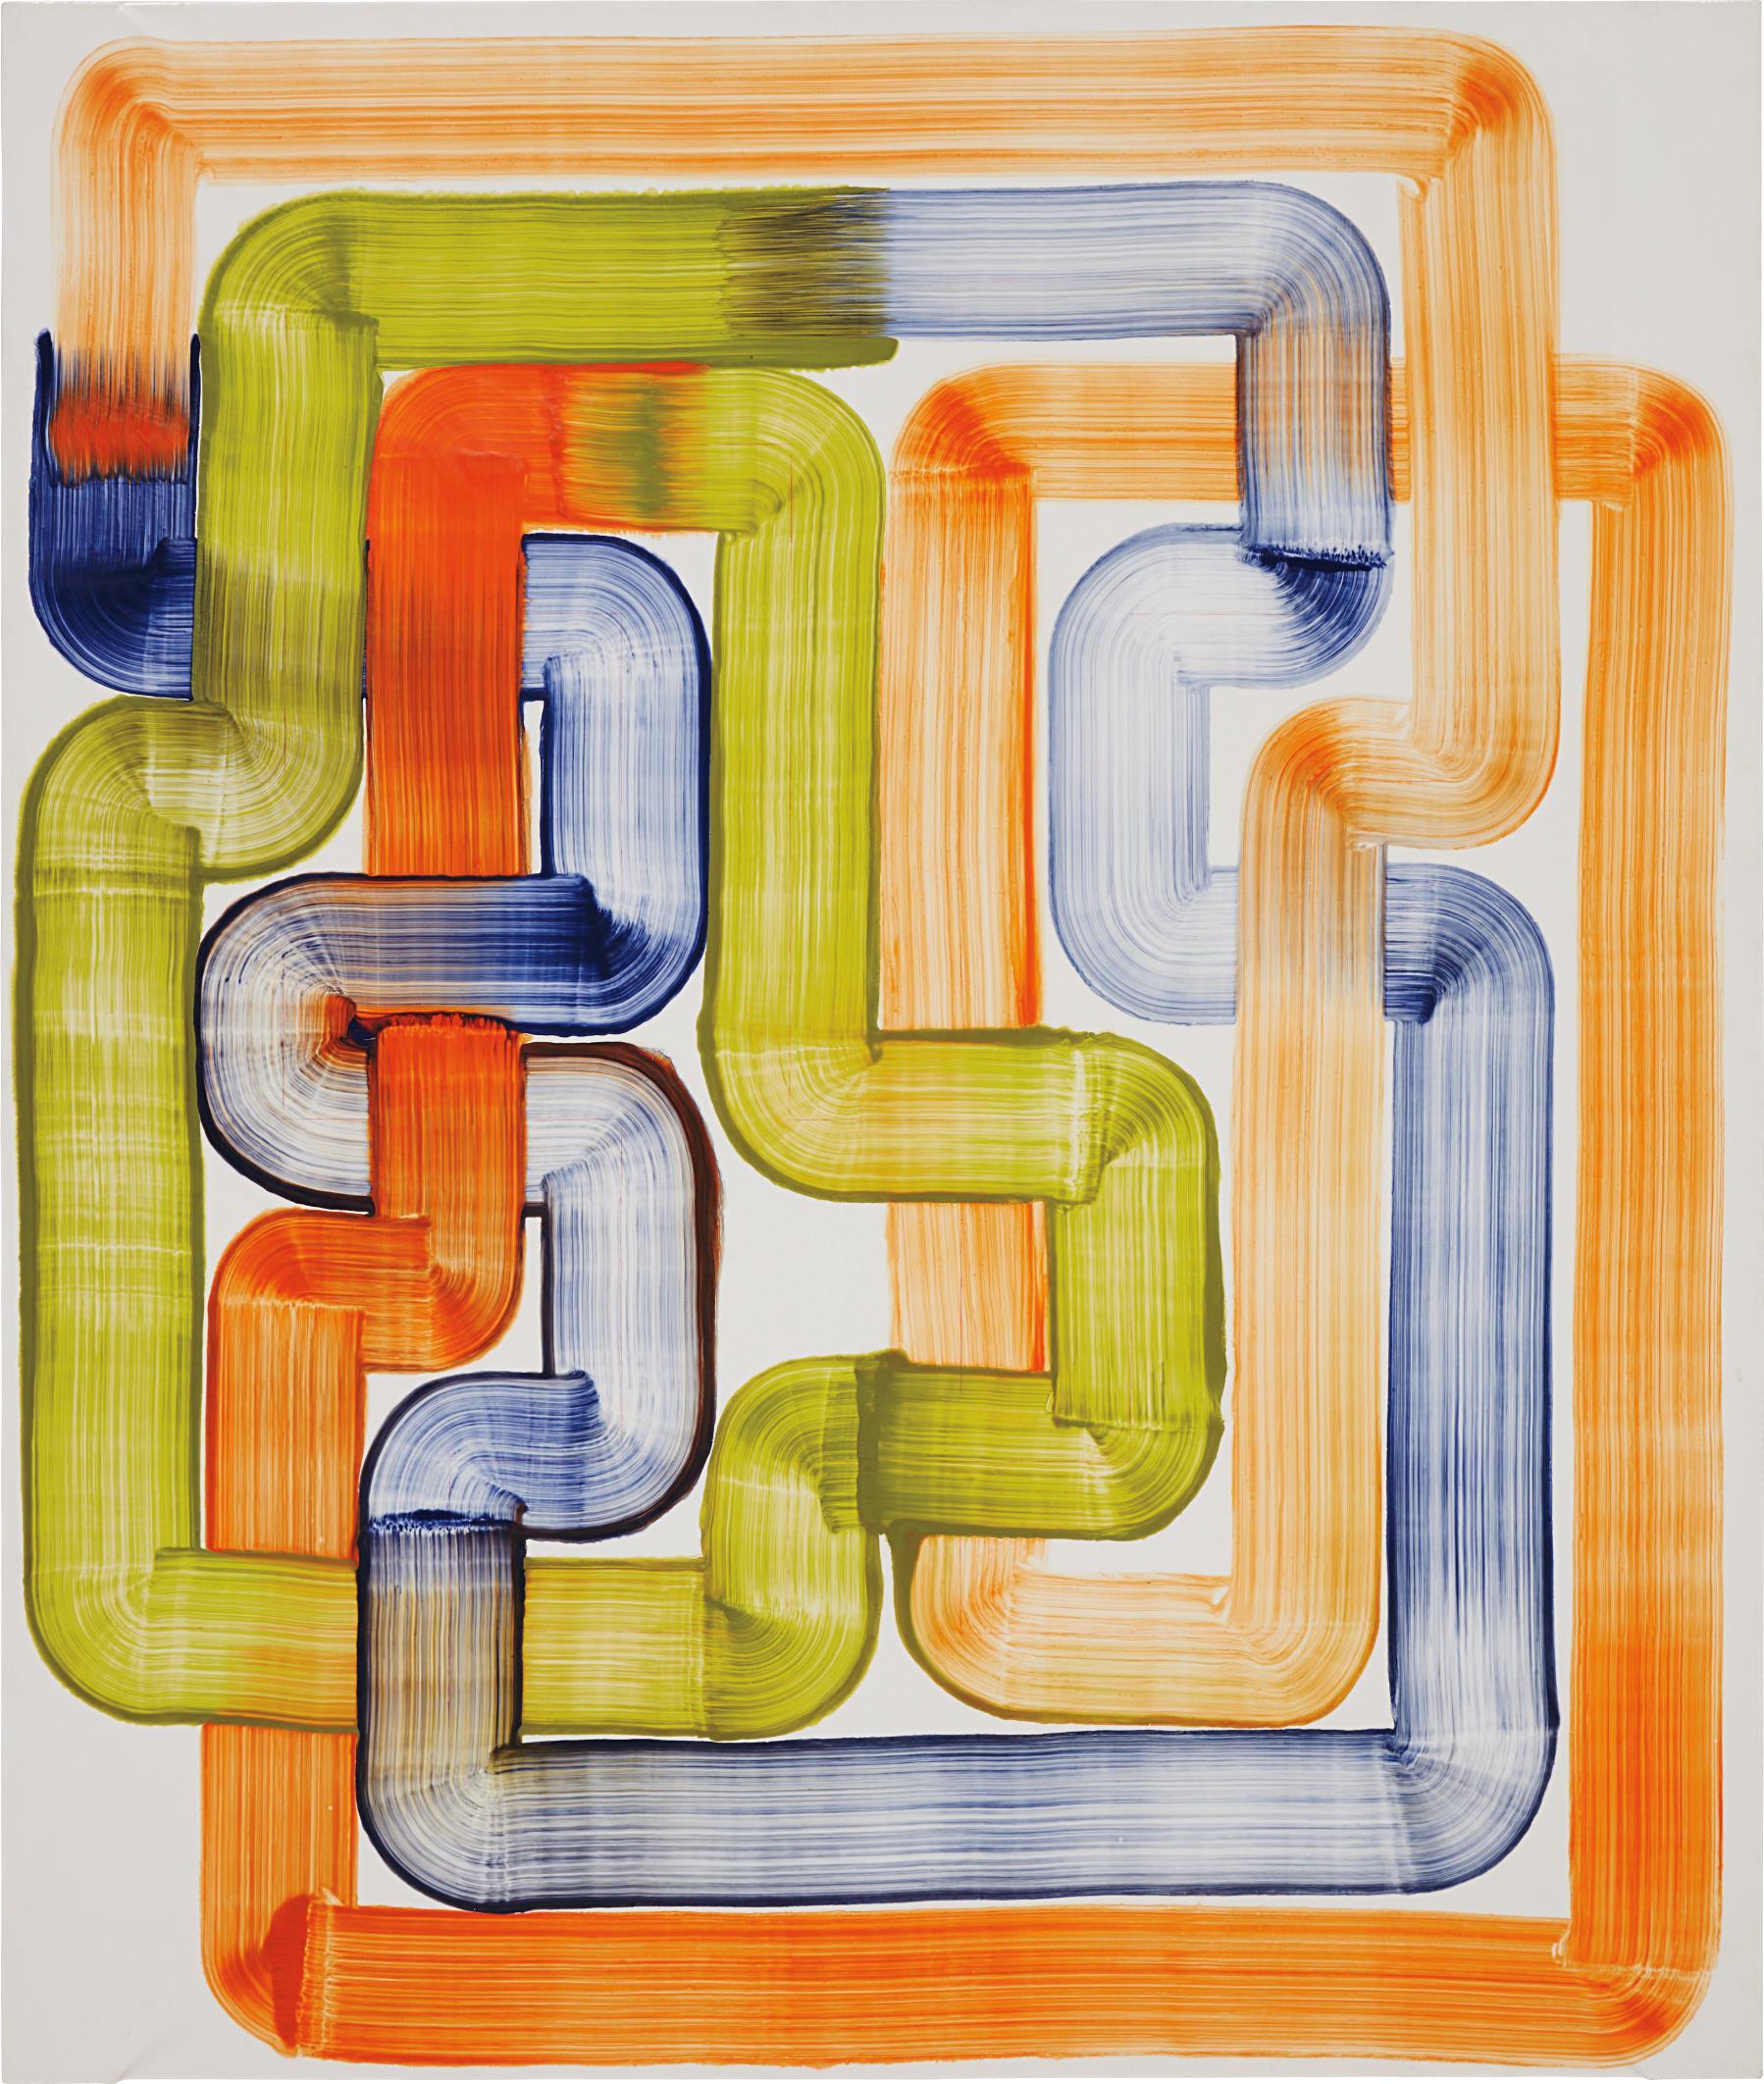 Bernard Frize-Isotopie-2006